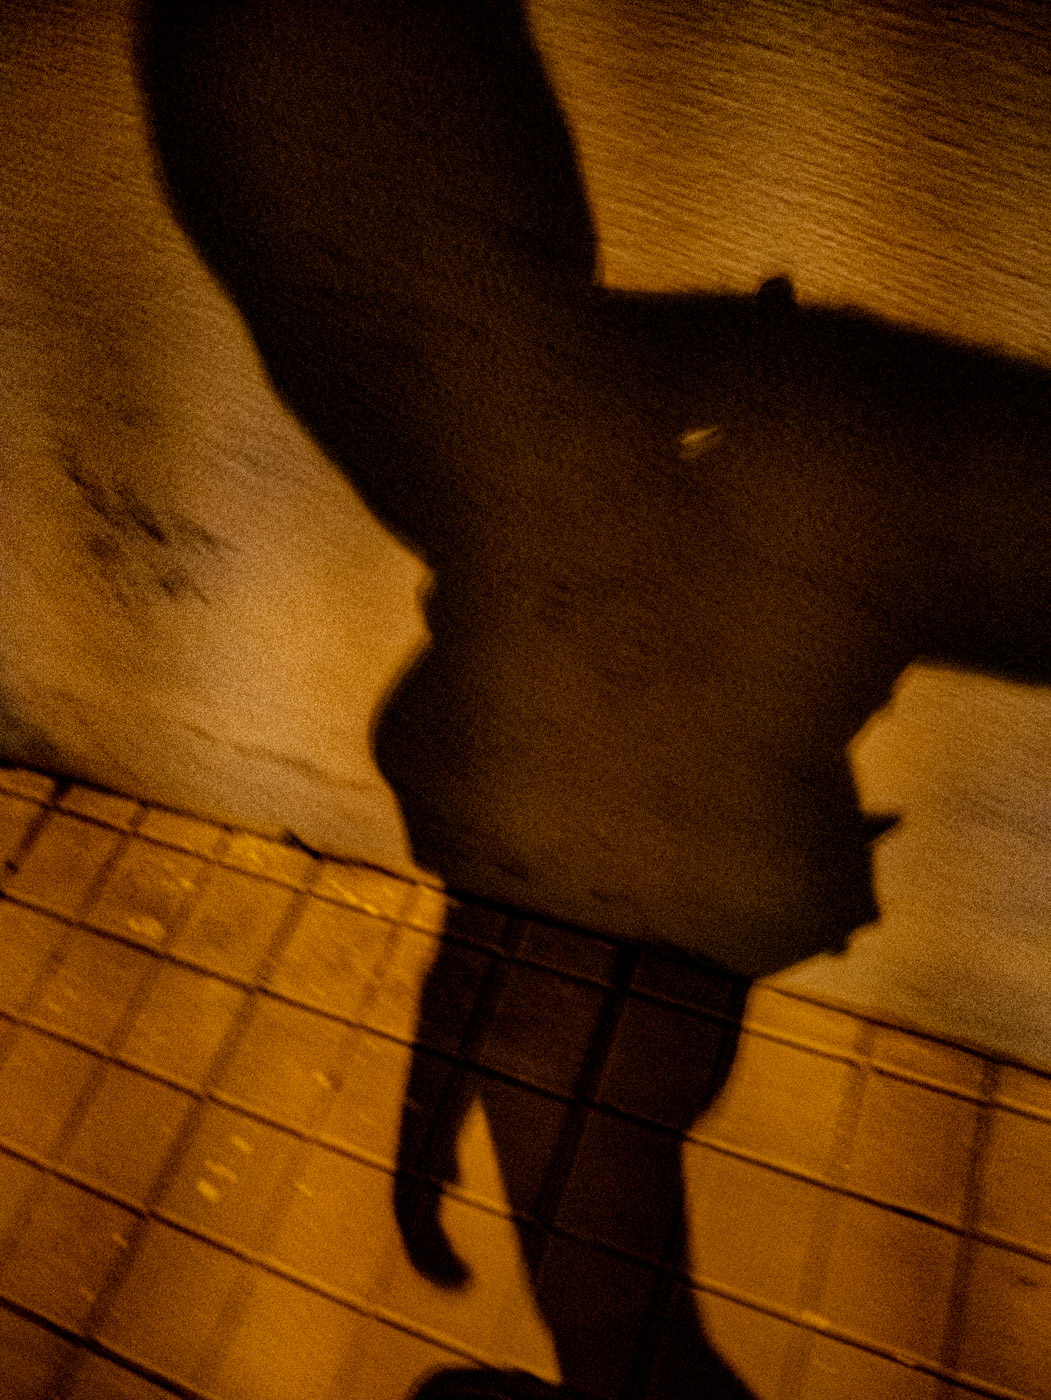 La luz atrapada - davidortega, fotografía